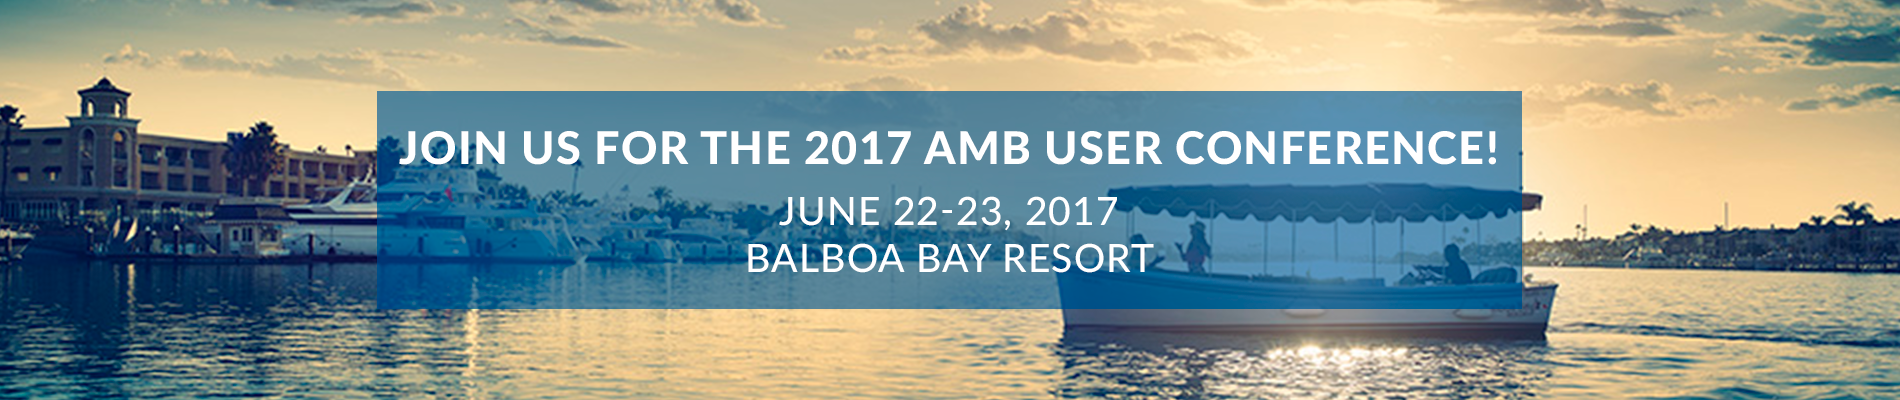 AMB_userconf17_slider-1